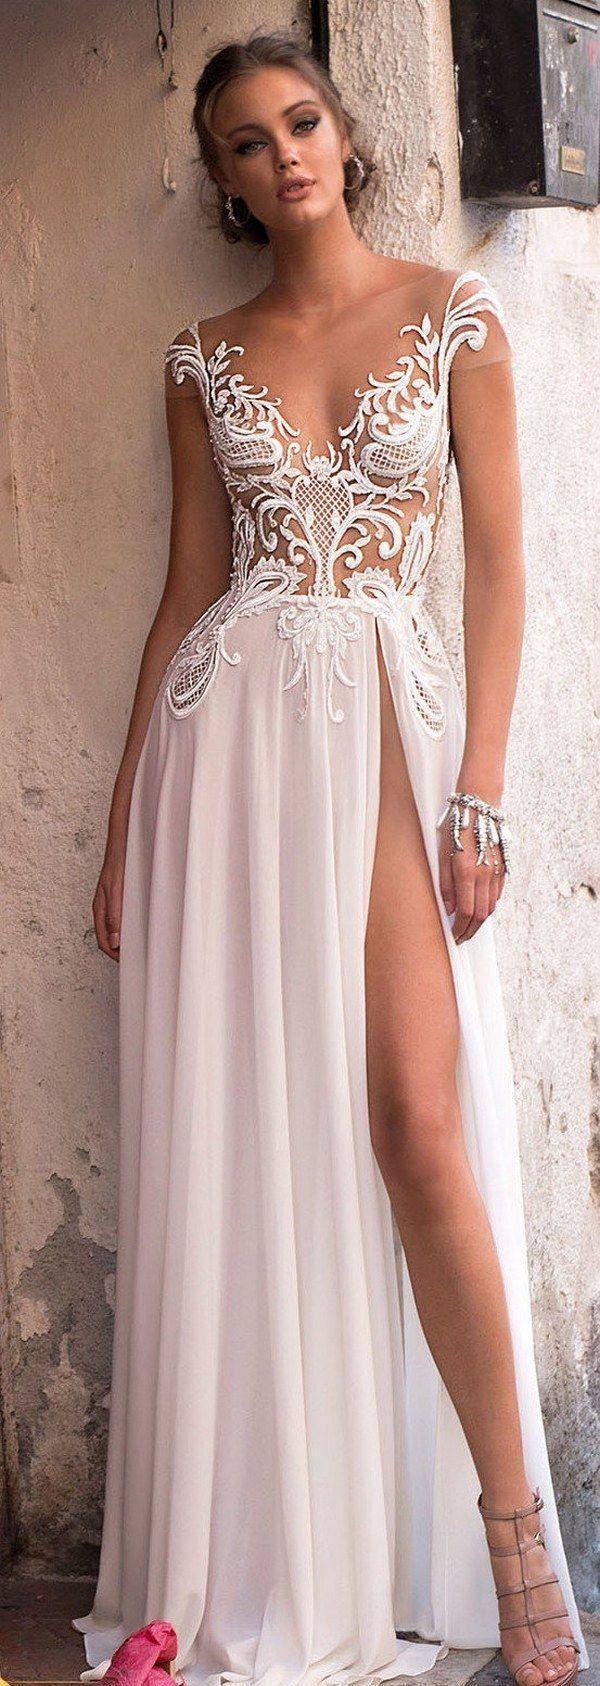 Muse by berta sicily wedding dresses bali wedding pinterest